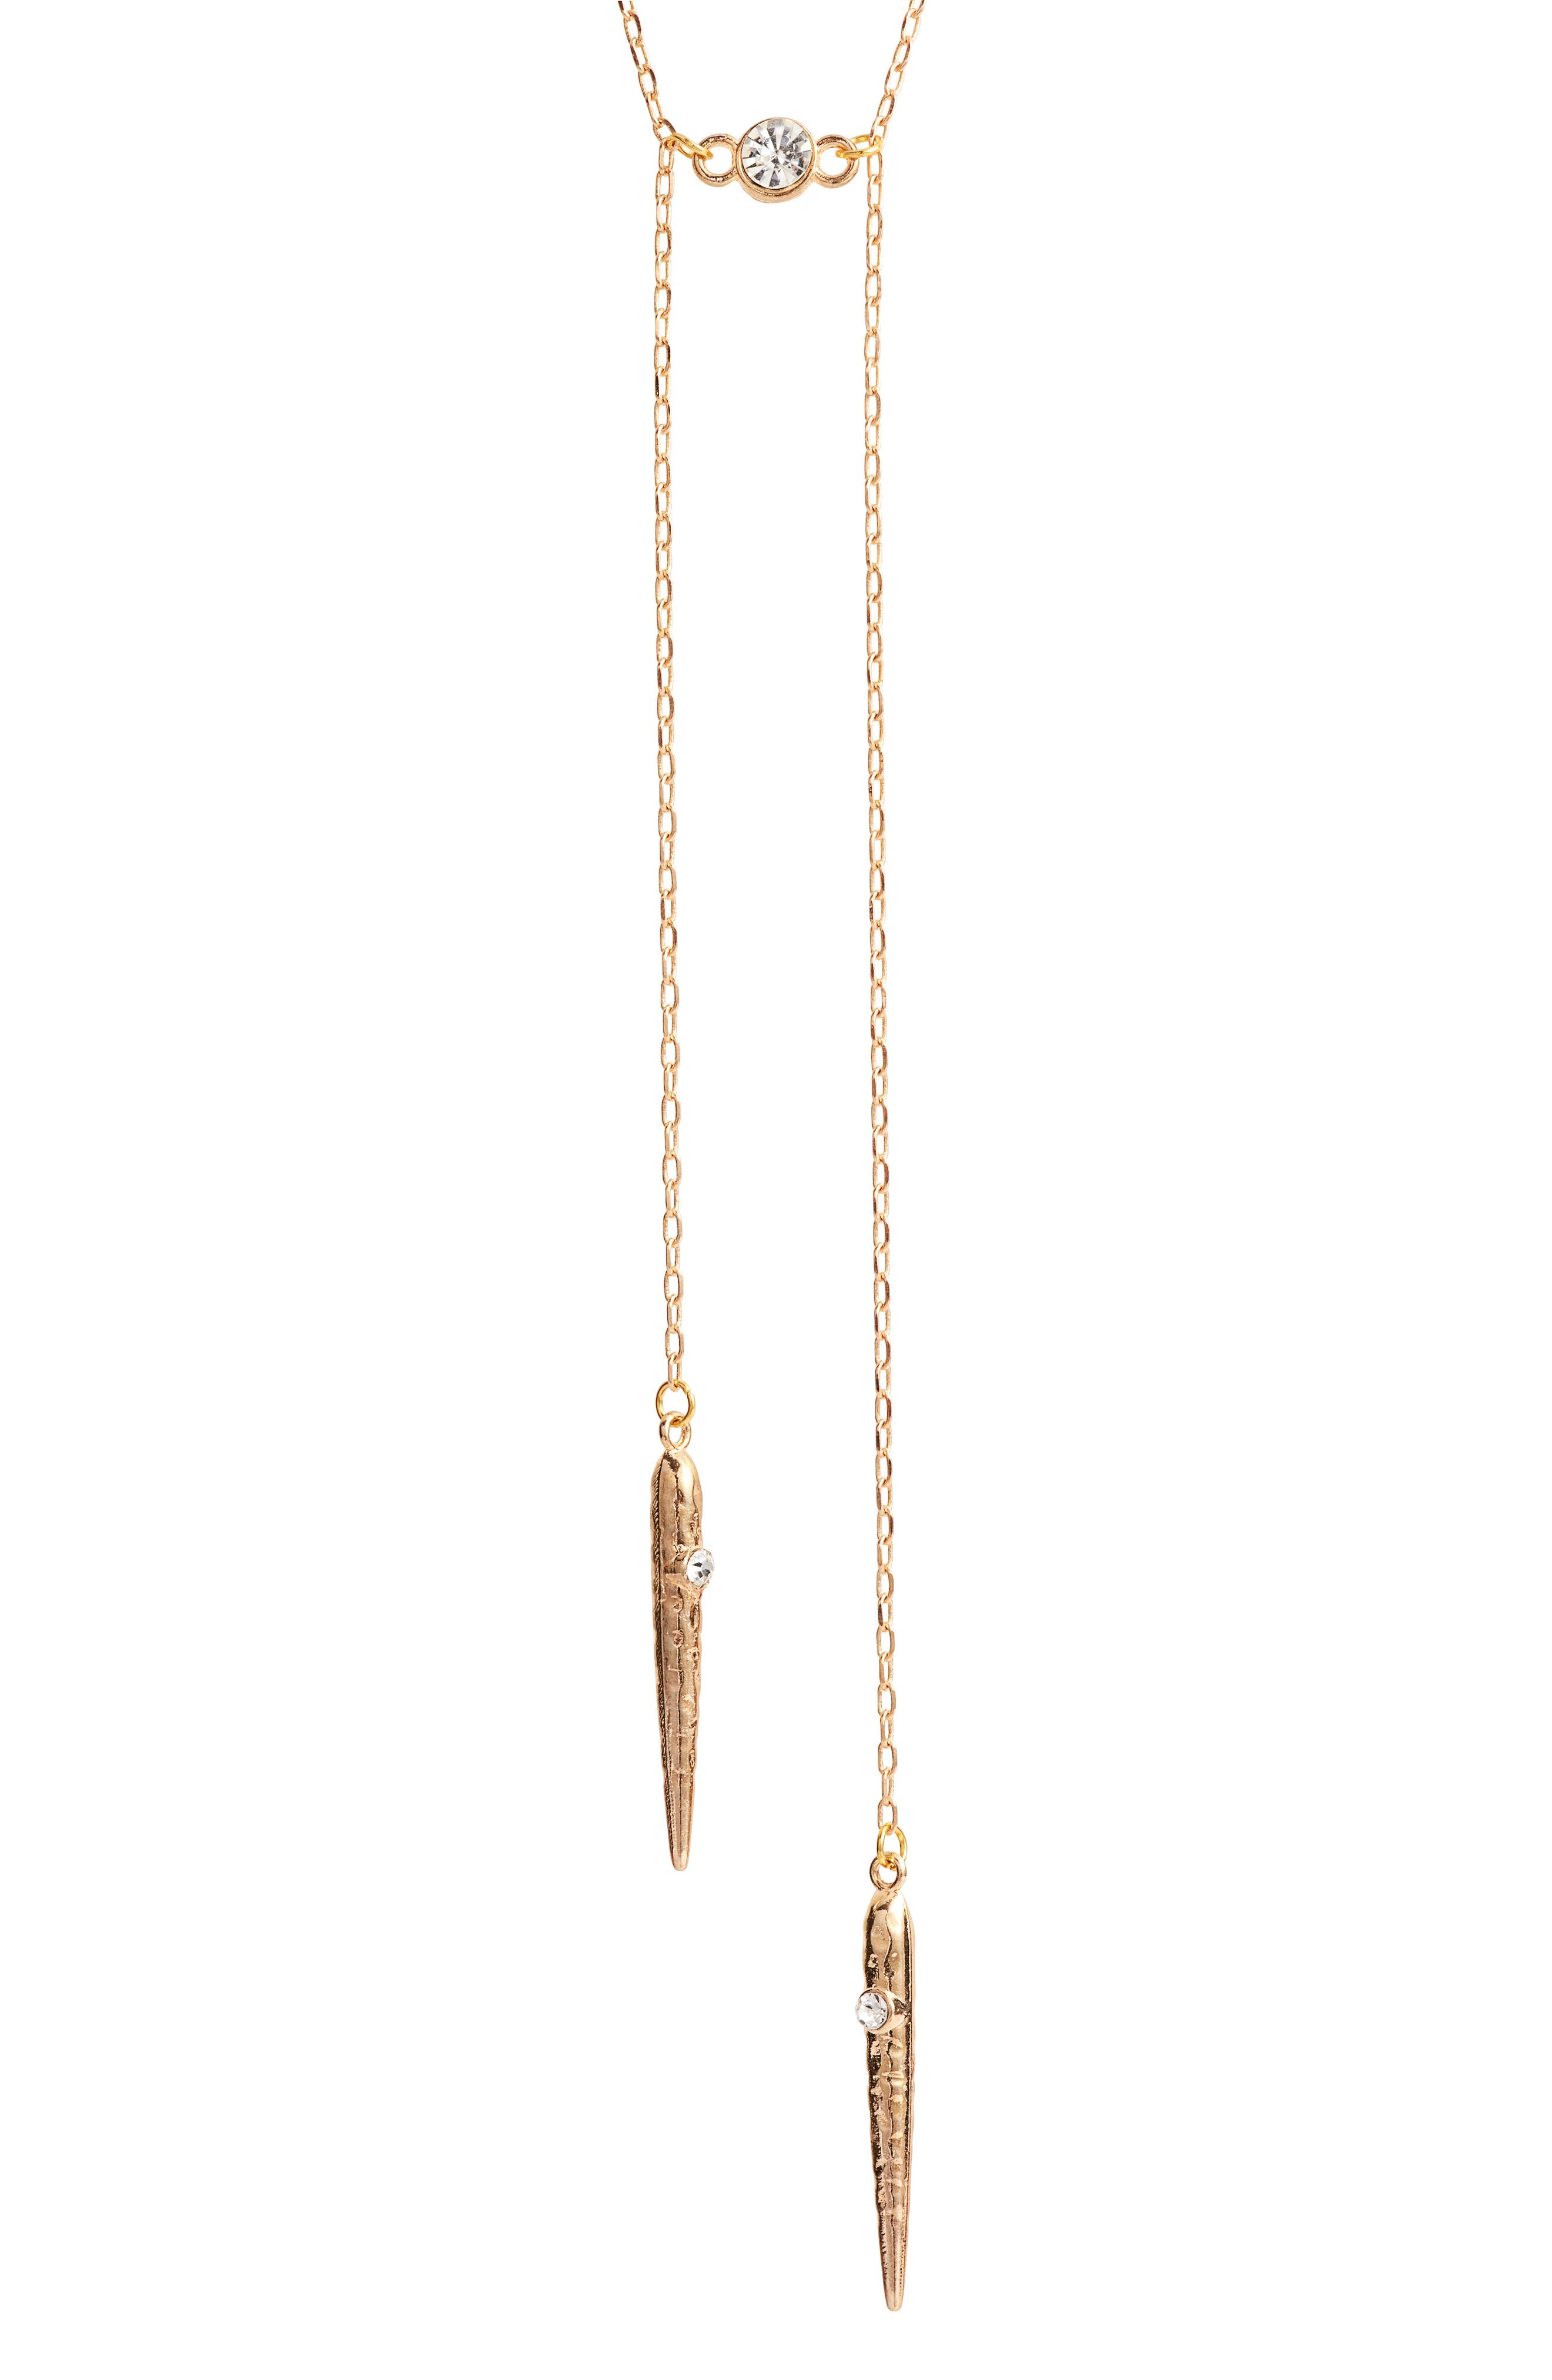 Cherrelle Bolo Necklace,                             Alternate thumbnail 2, color,                             GOLD